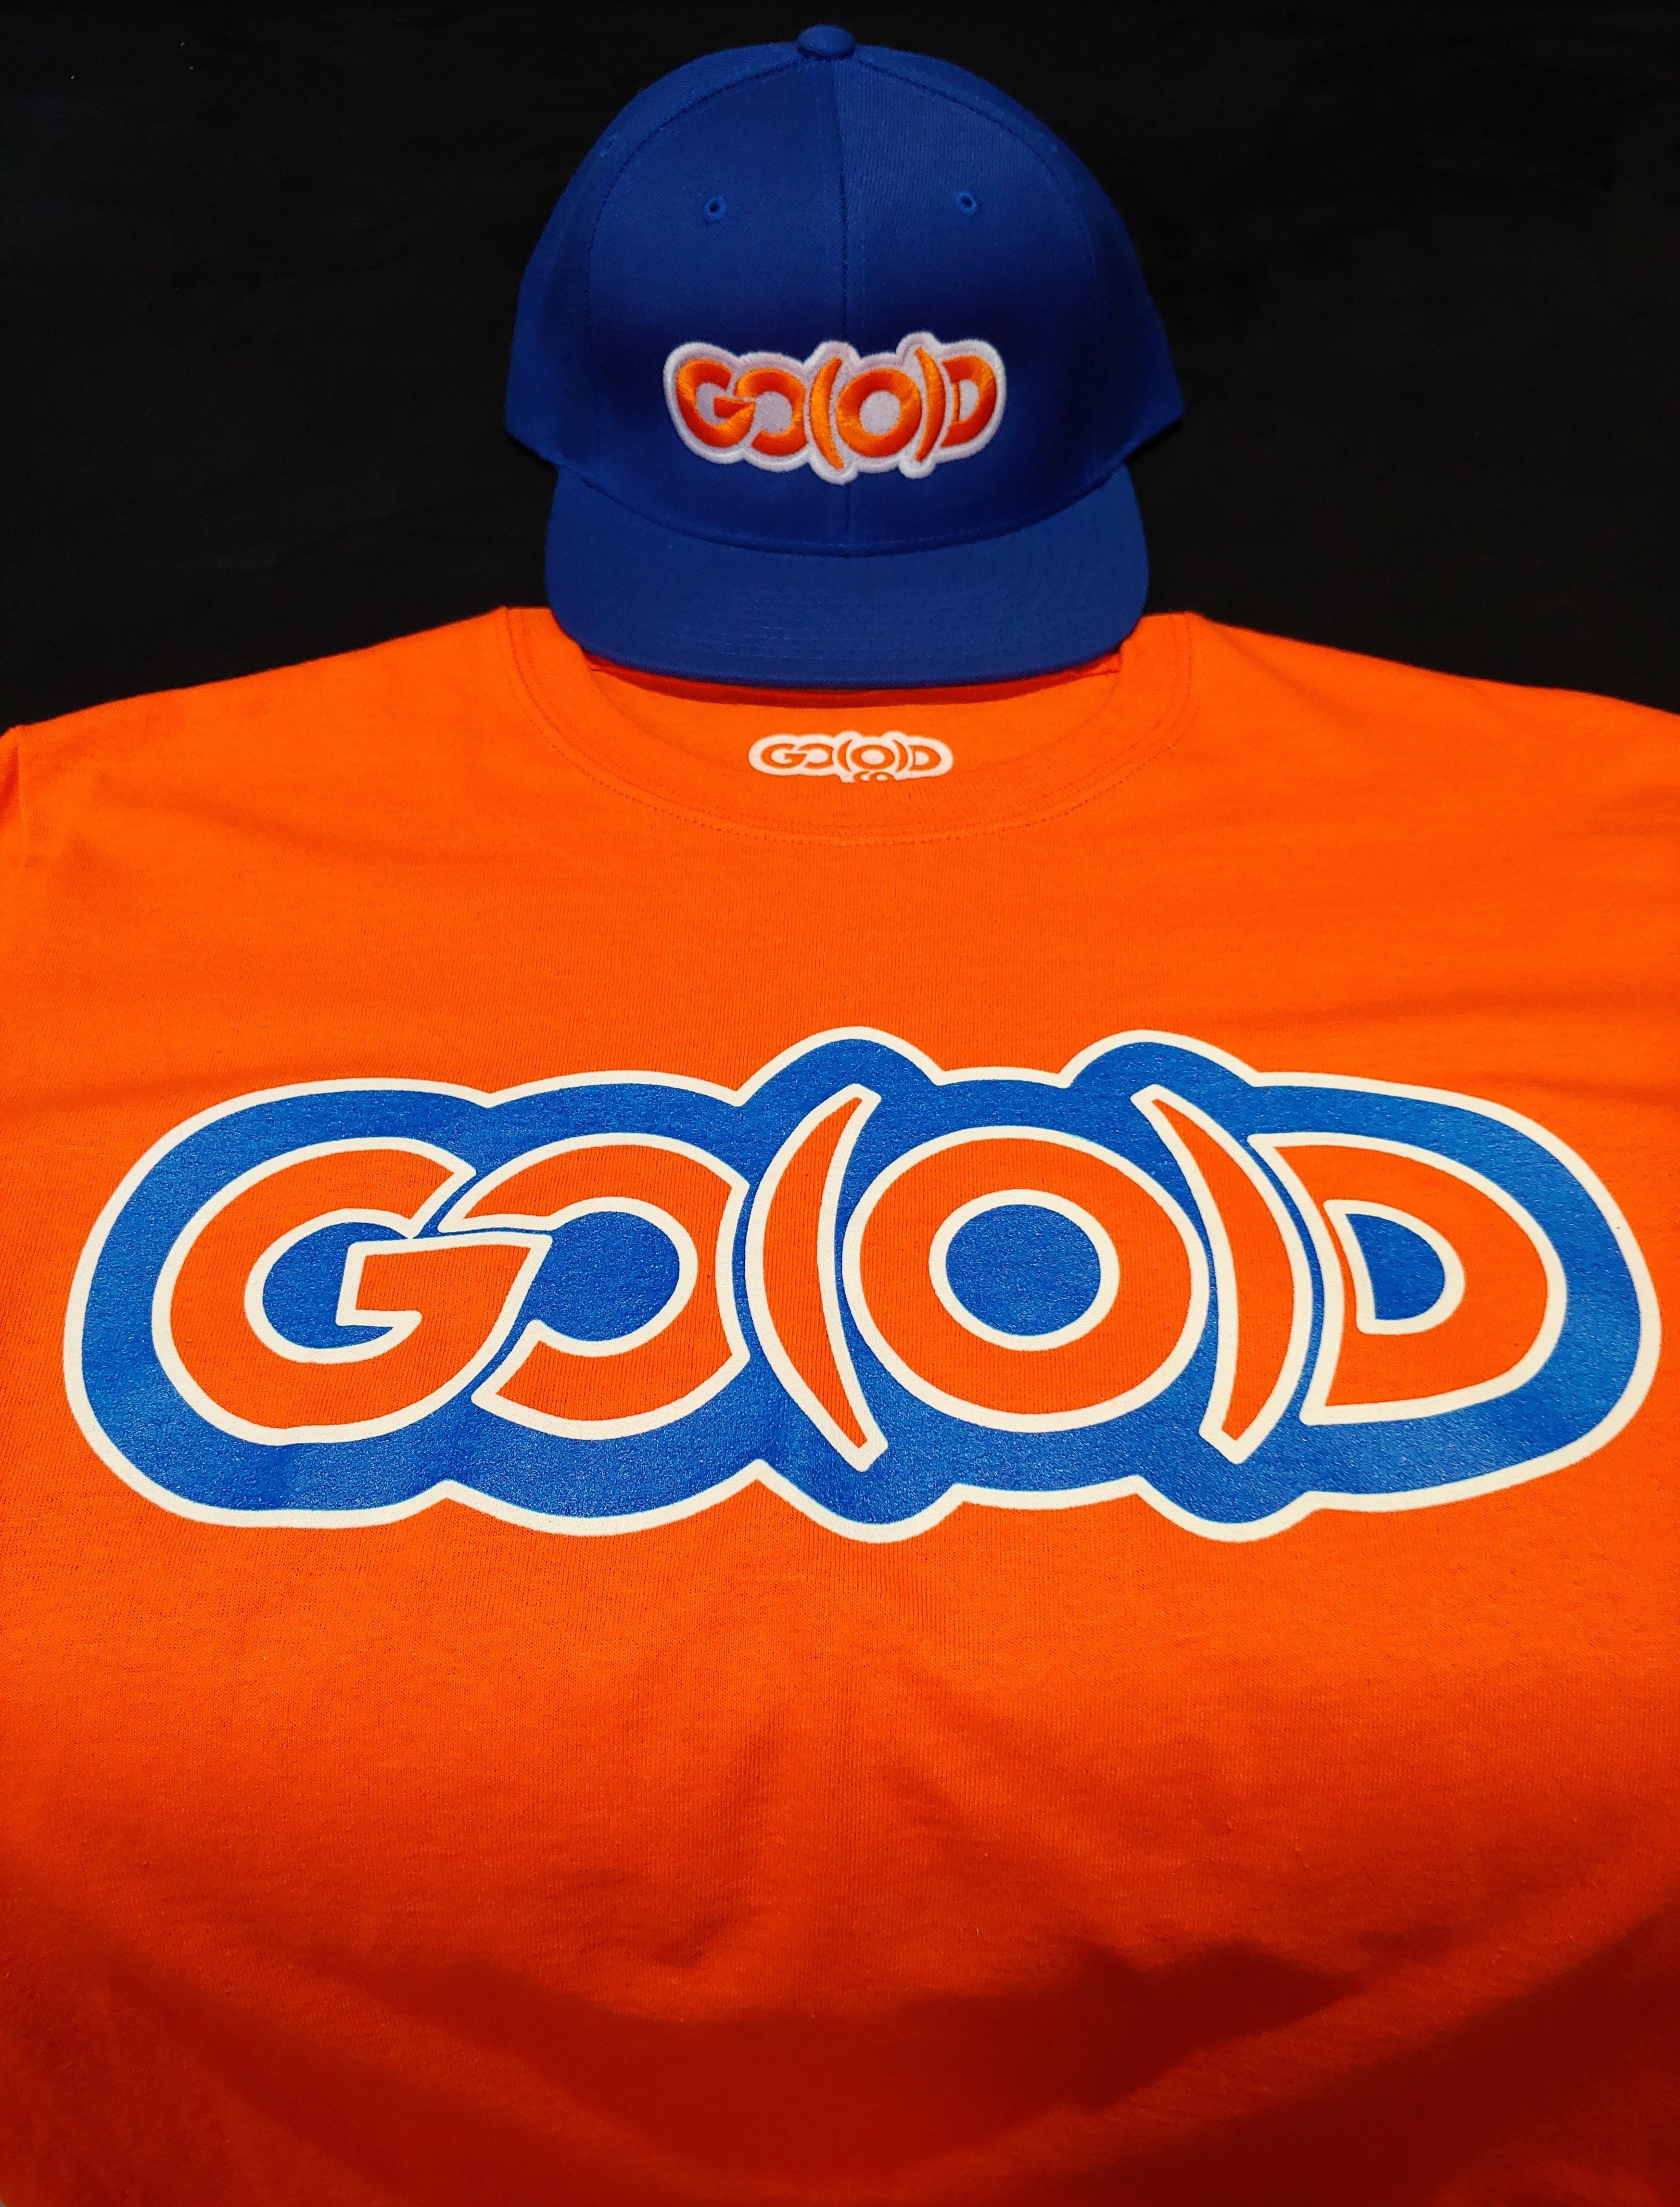 GO(O)D Snapback-royal/orange/white